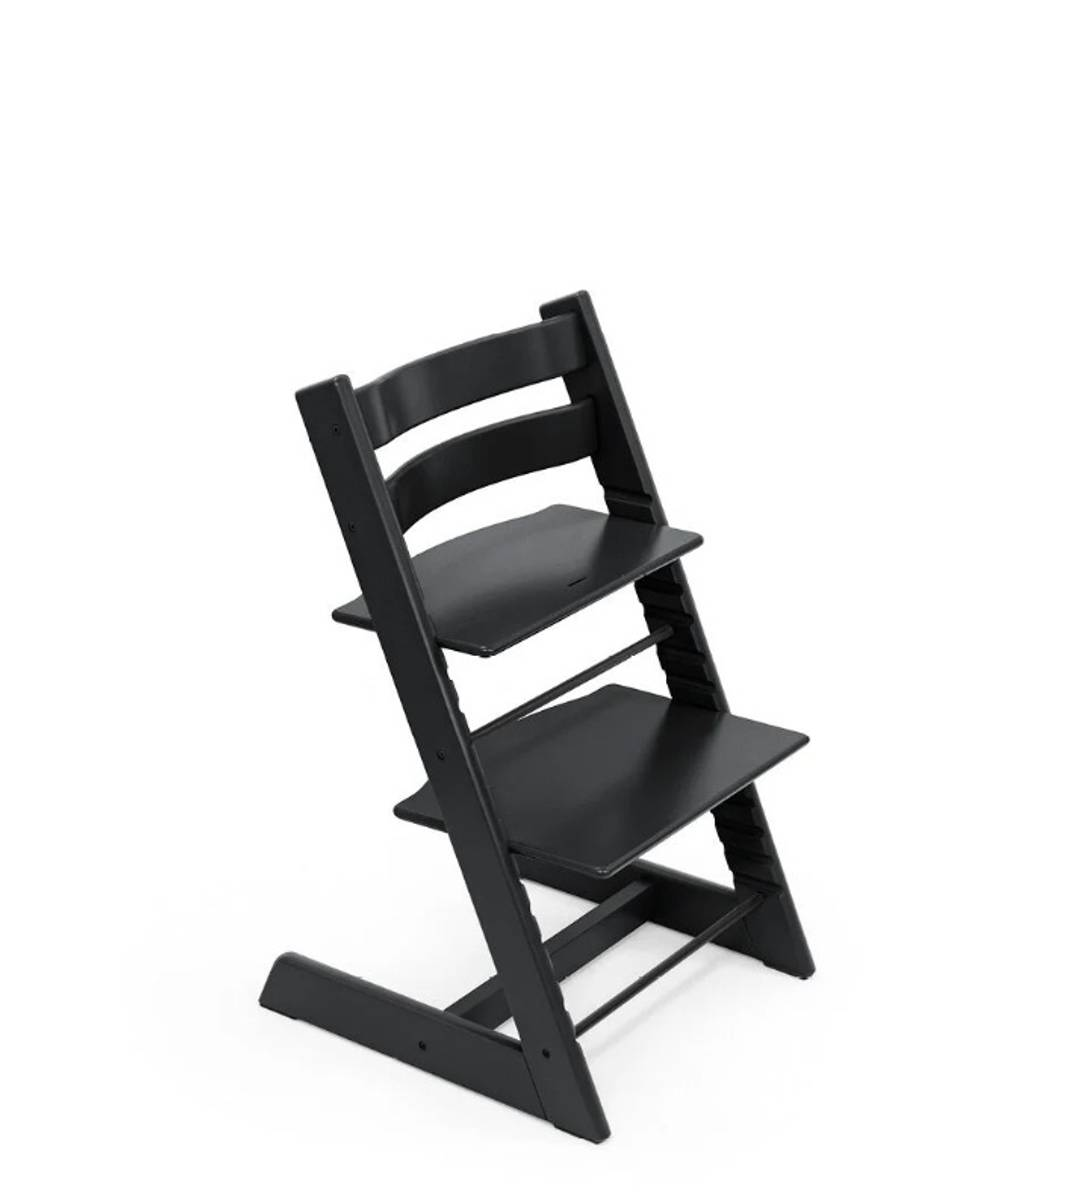 Stokke TRIPP TRAPP Stol | Black